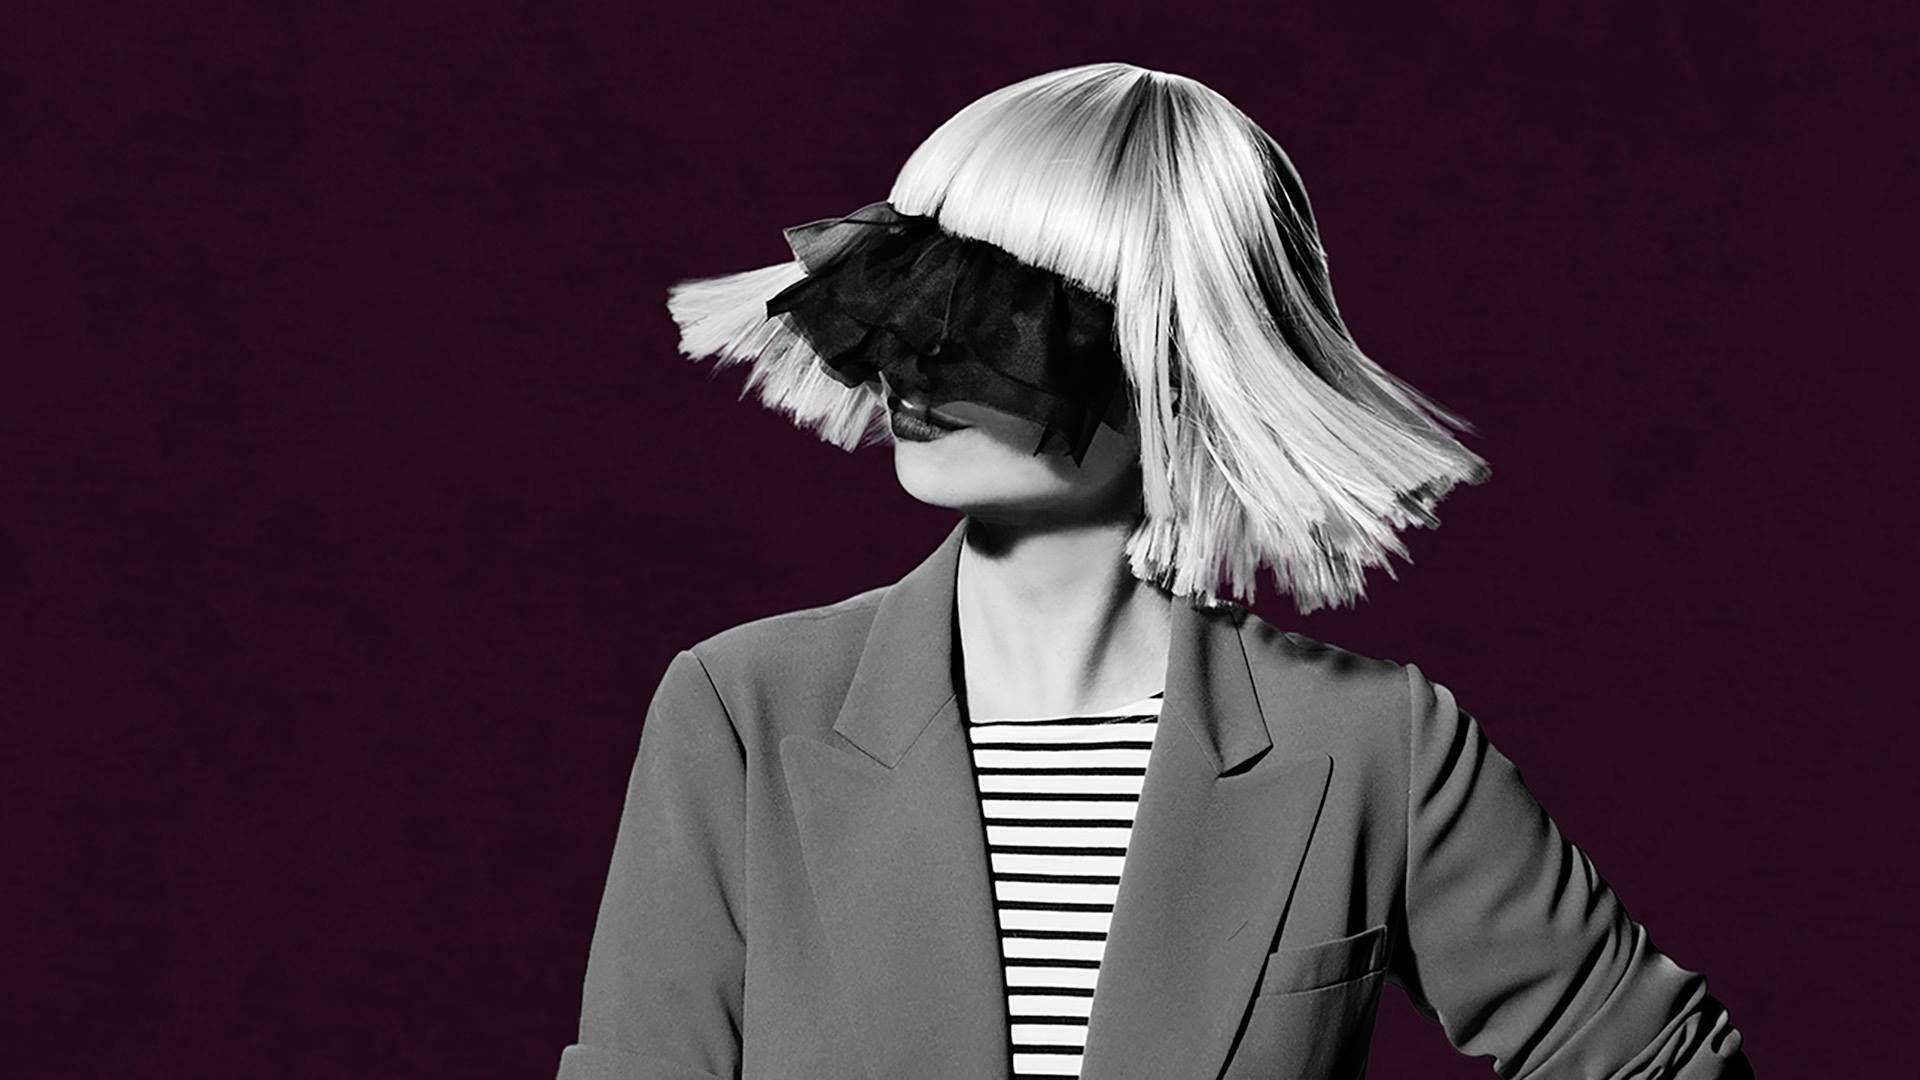 Sia Furler Photo 4 Of 28 Pics Wallpaper